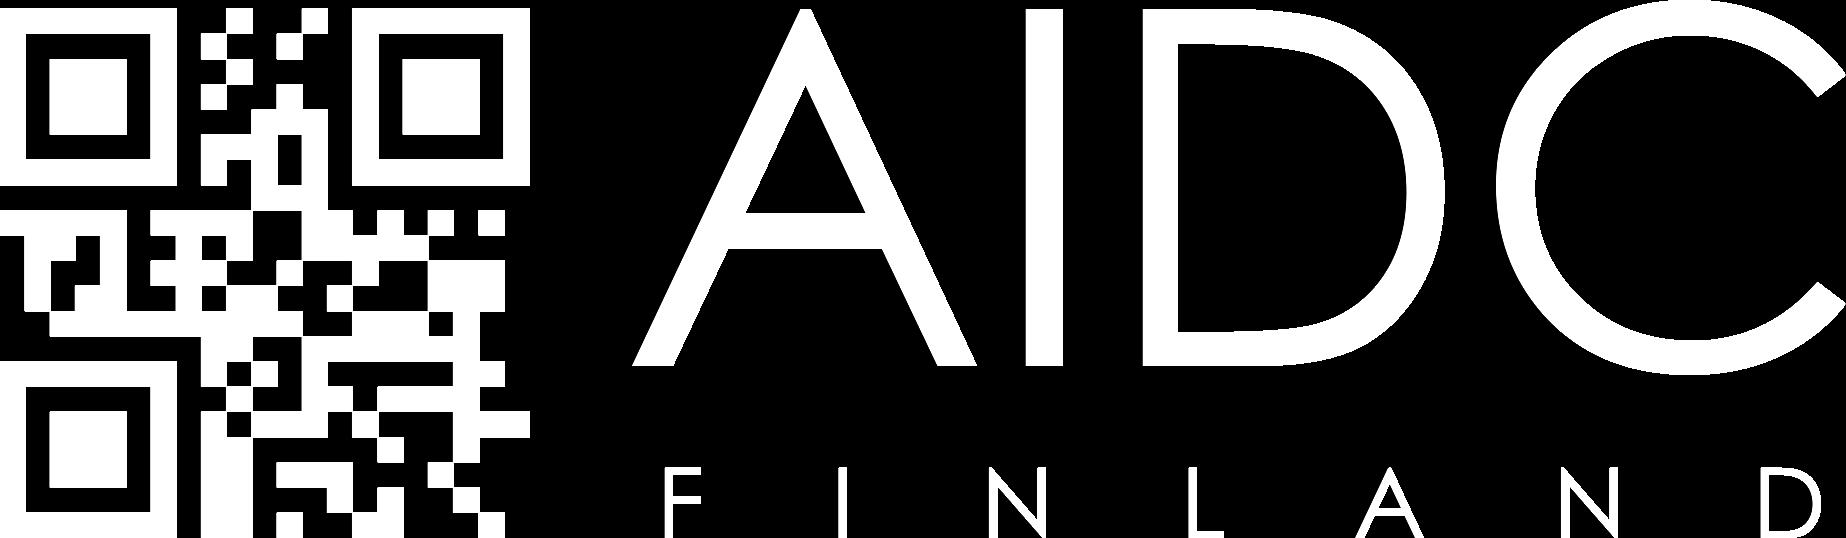 AIDC Finland